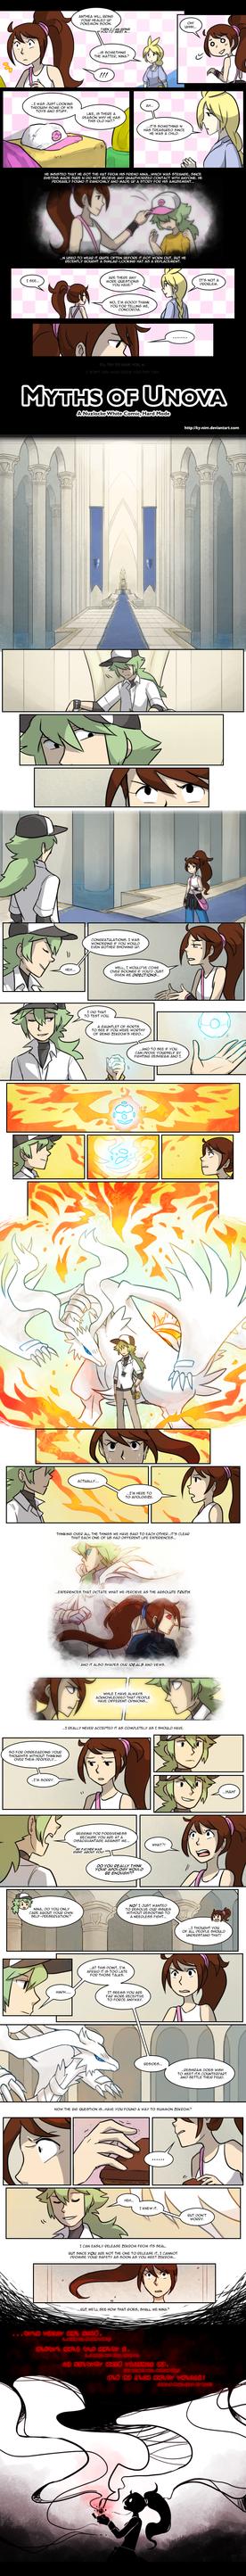 Nuzlocke White: The Throne Room by ky-nim